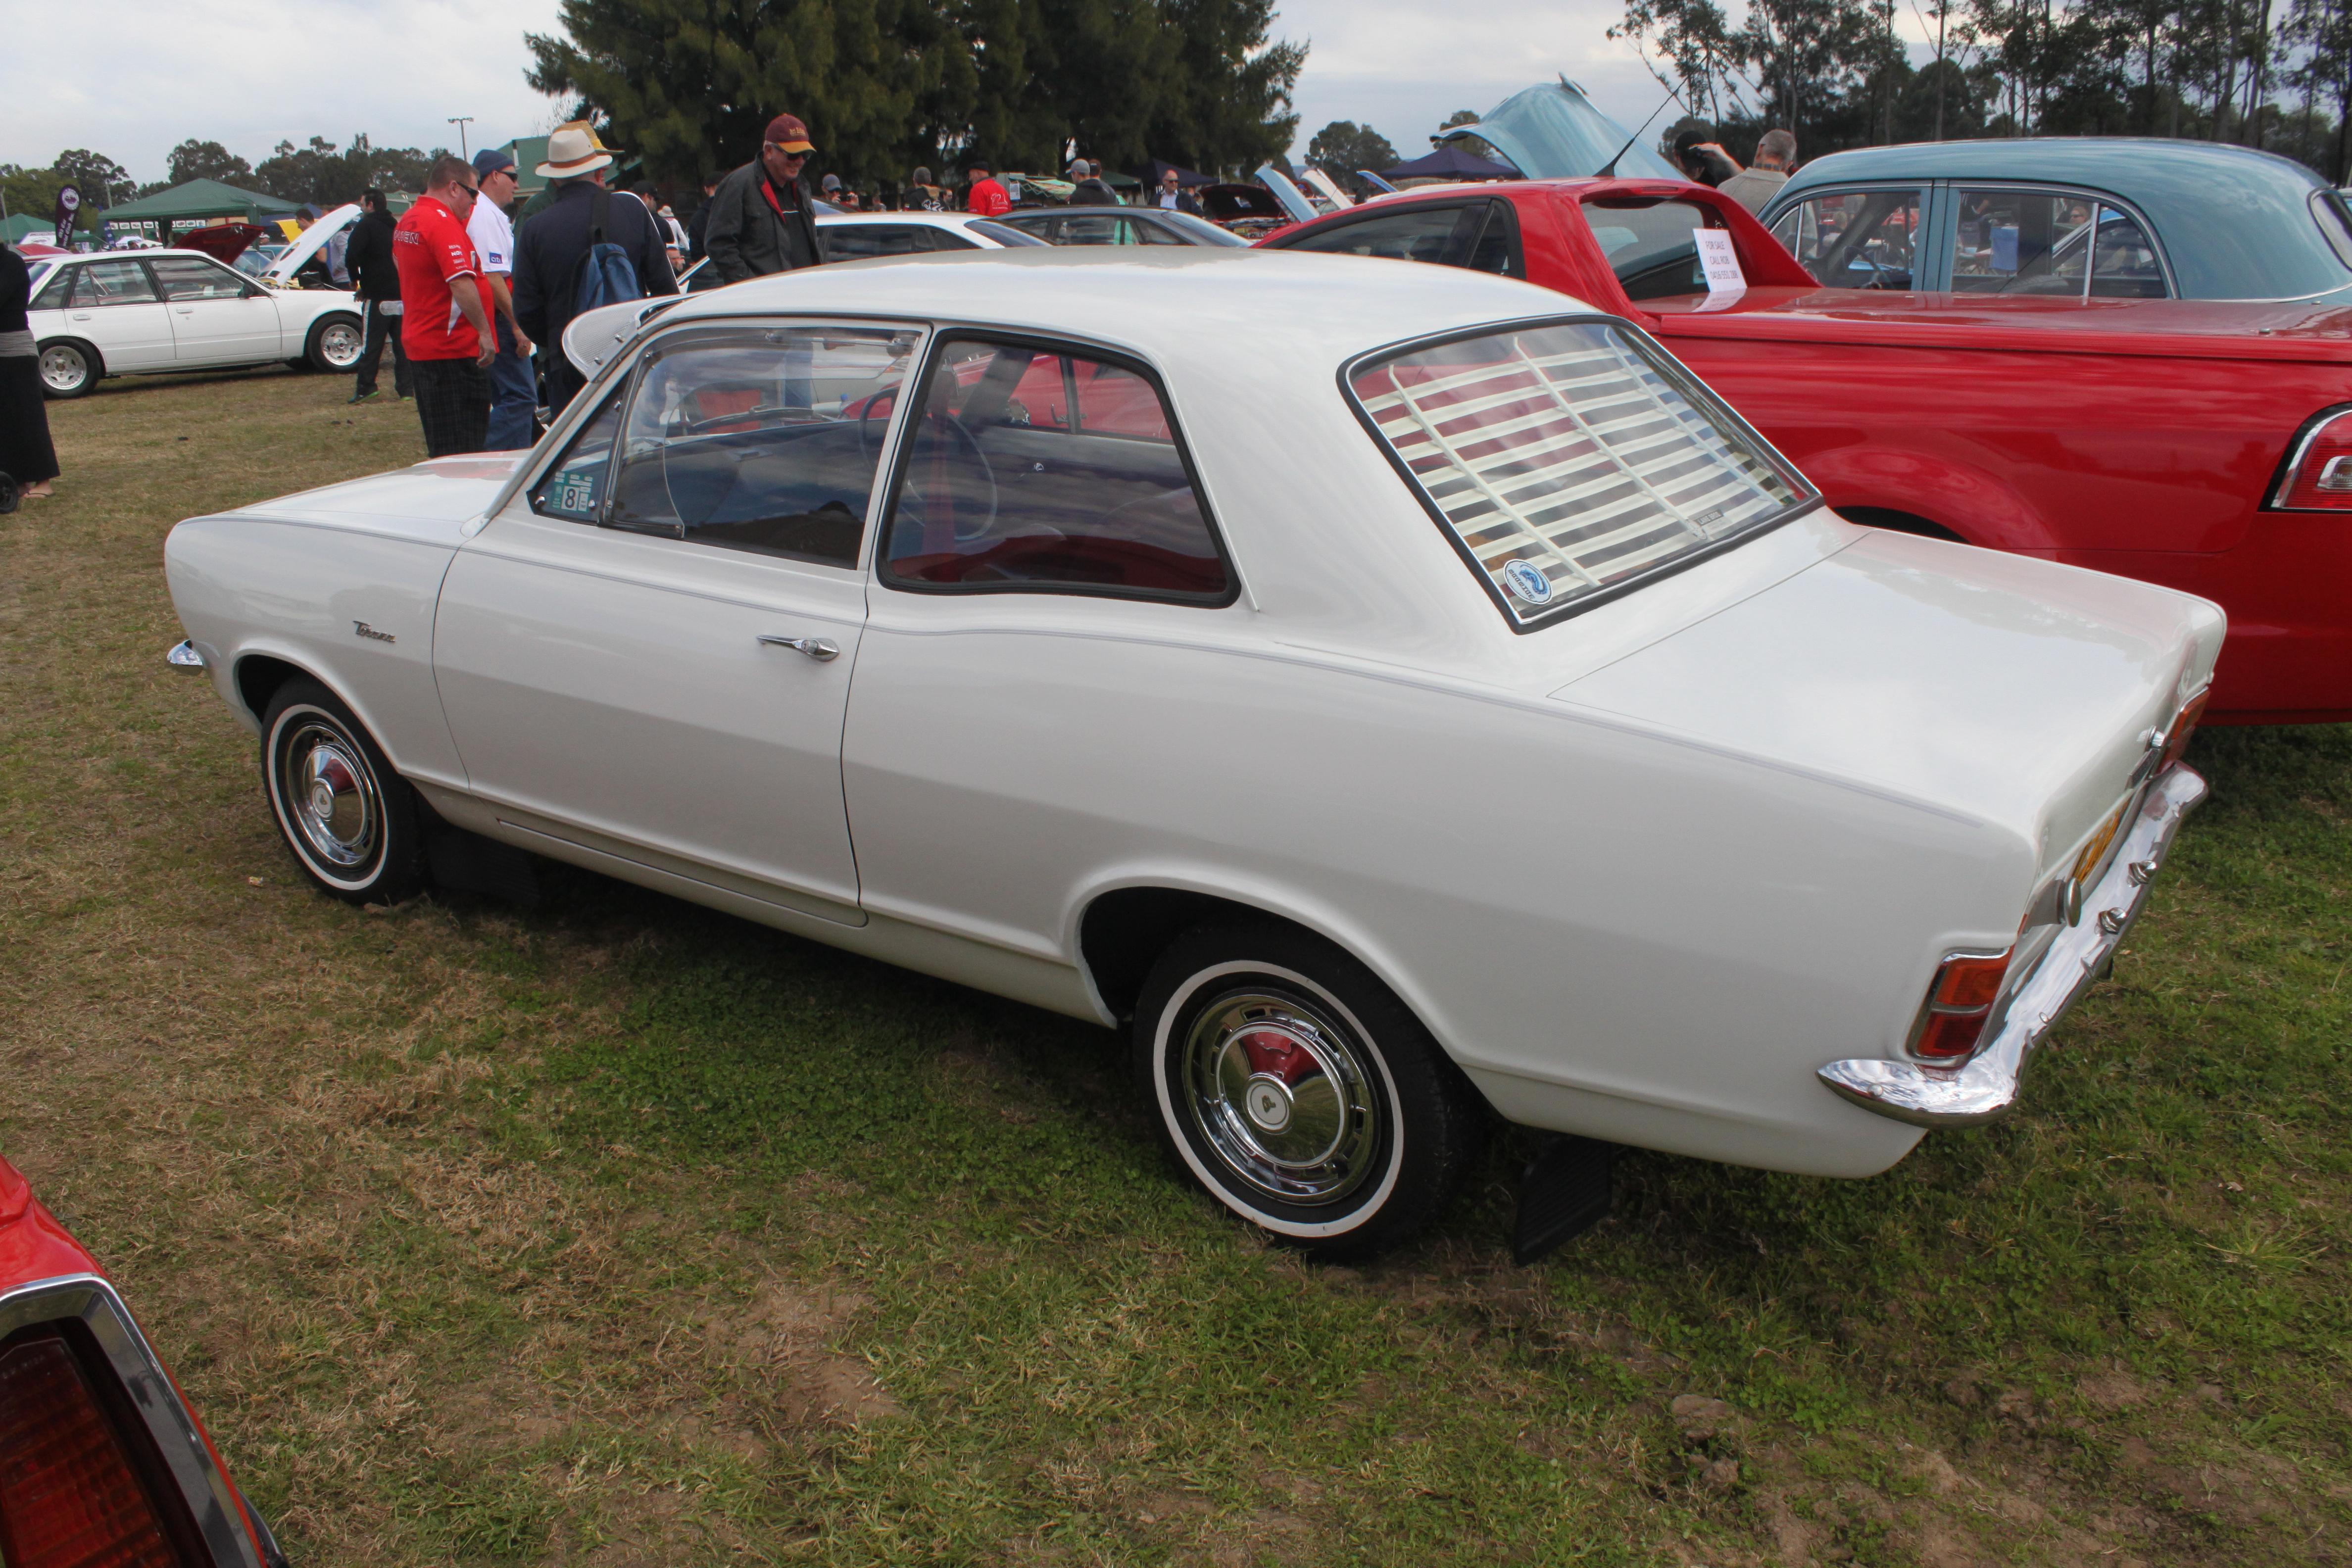 File:1968 Holden Torana (HB) 2-door sedan (20830919242 ...